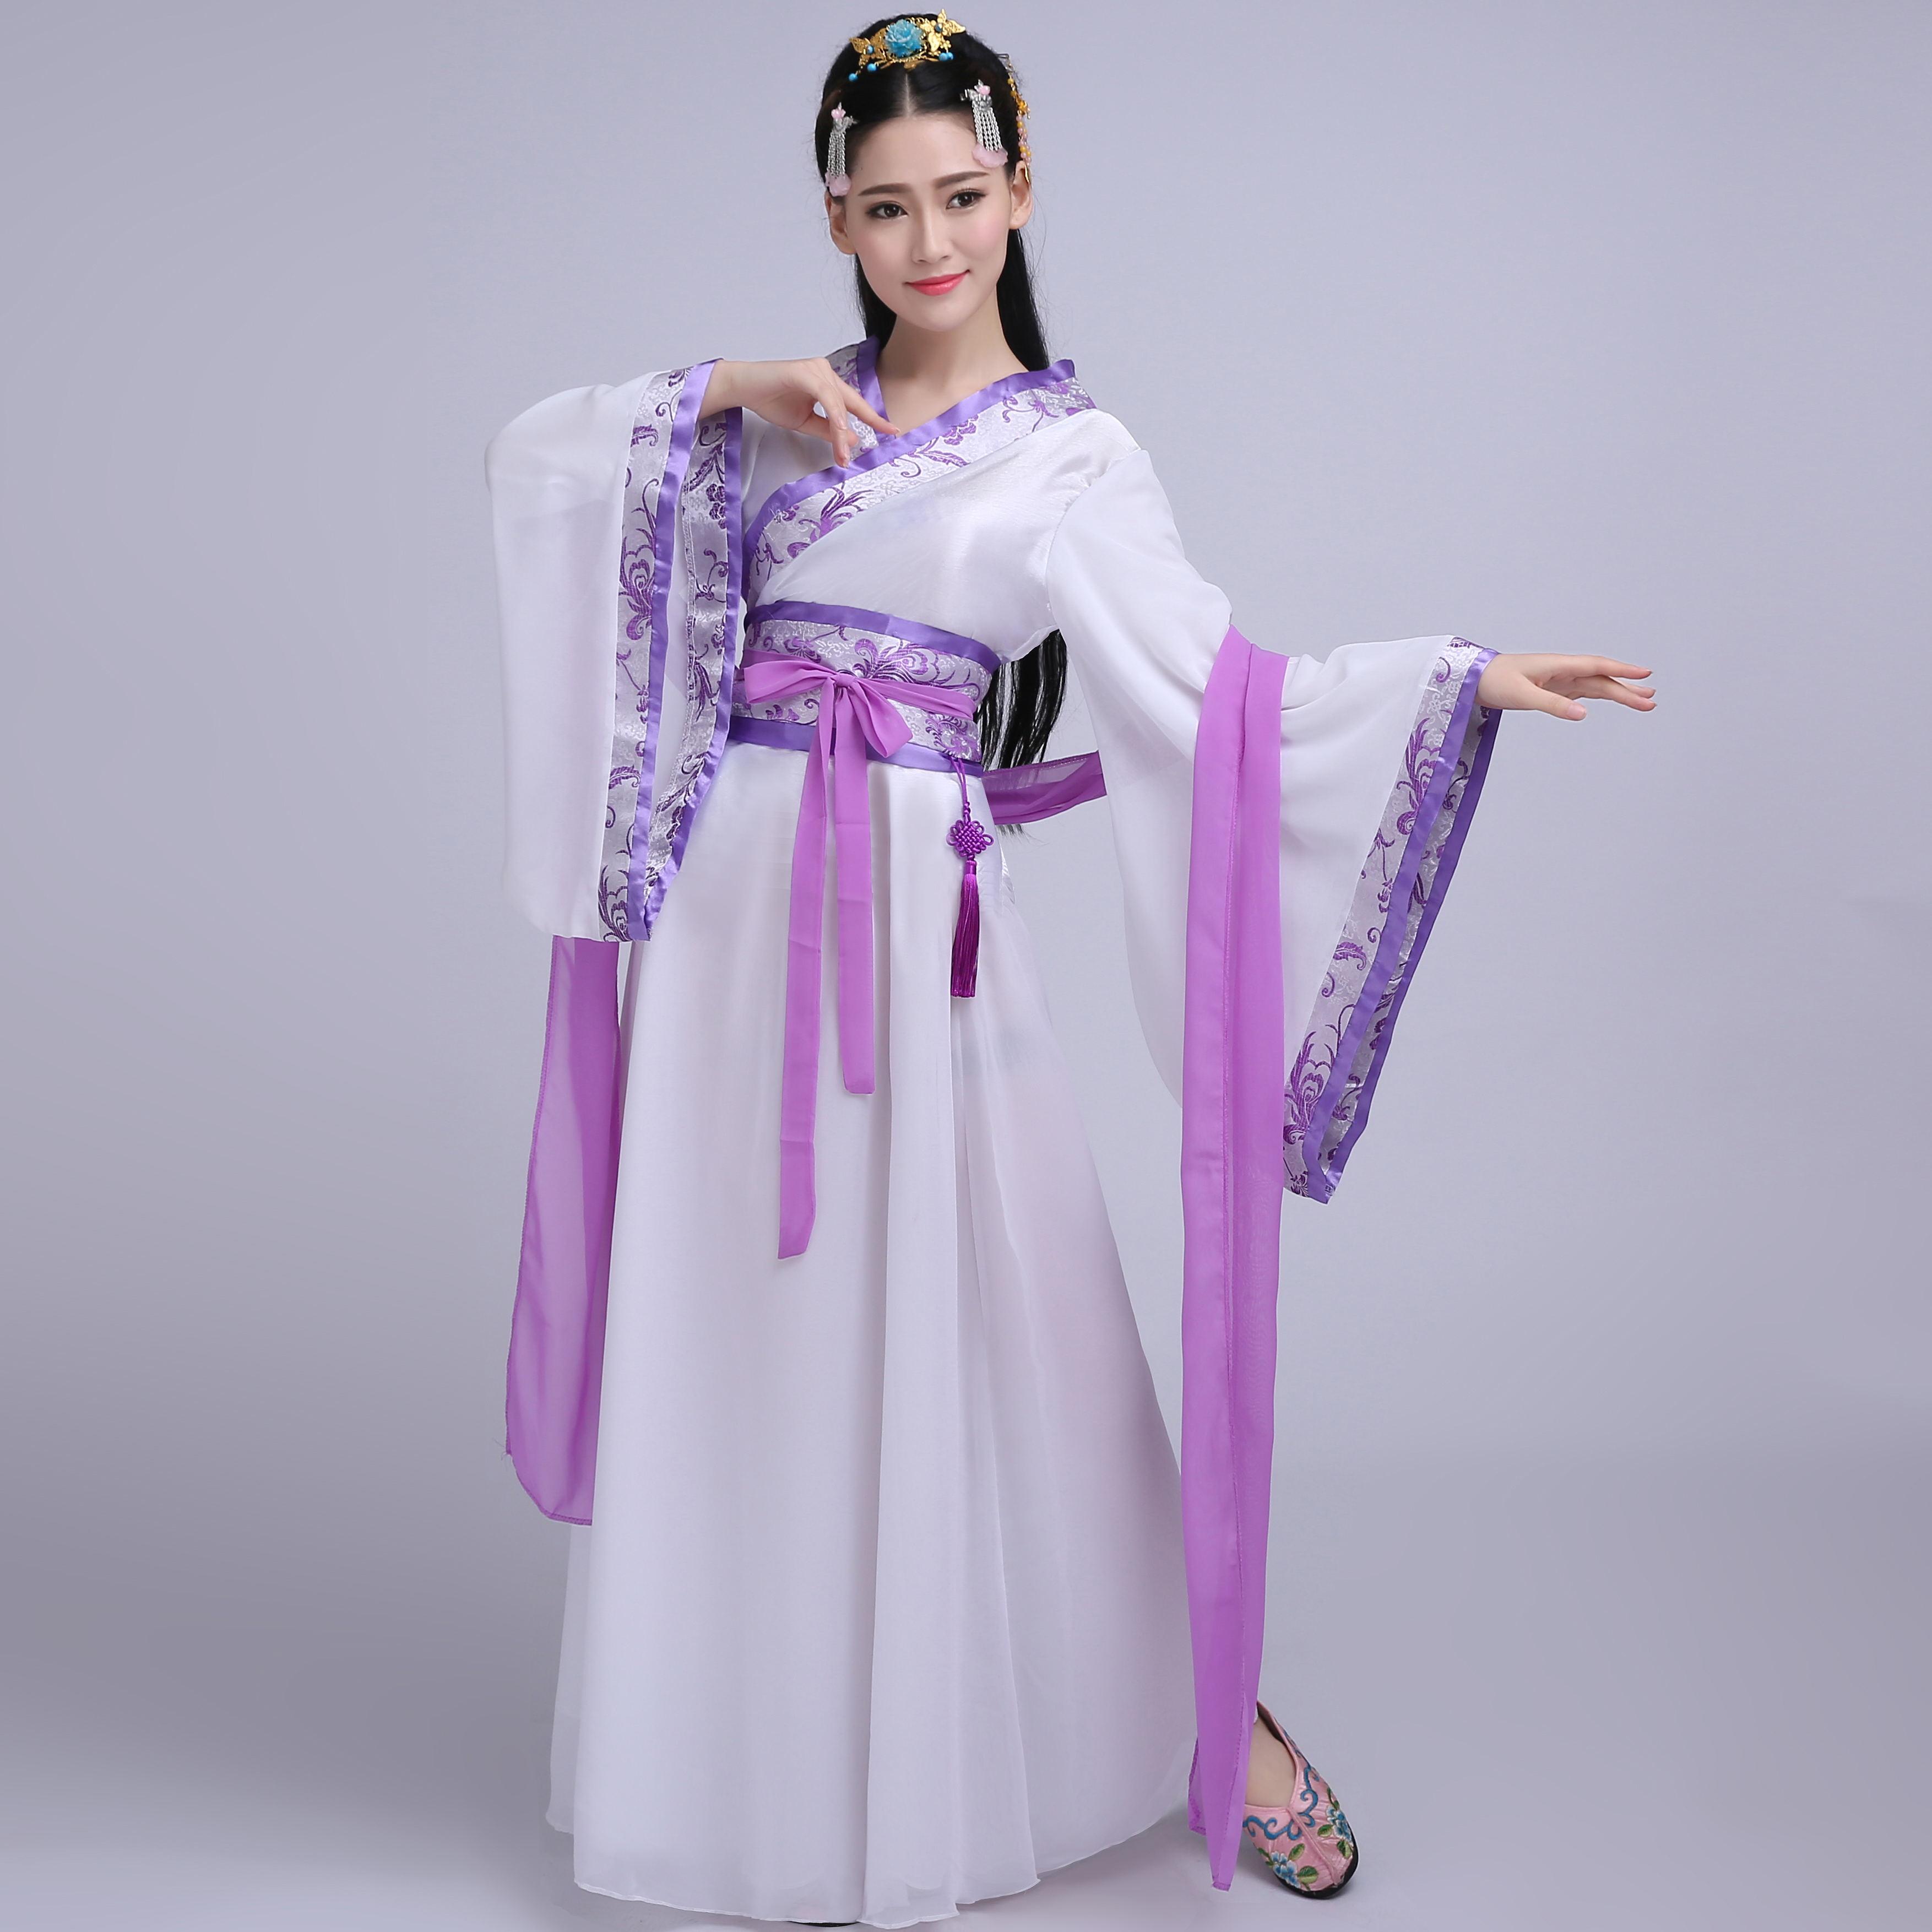 aeb0e448c ... lightbox moreview · lightbox moreview · lightbox moreview · lightbox  moreview · lightbox moreview. PrevNext. Photography costume hanfu fairy ...